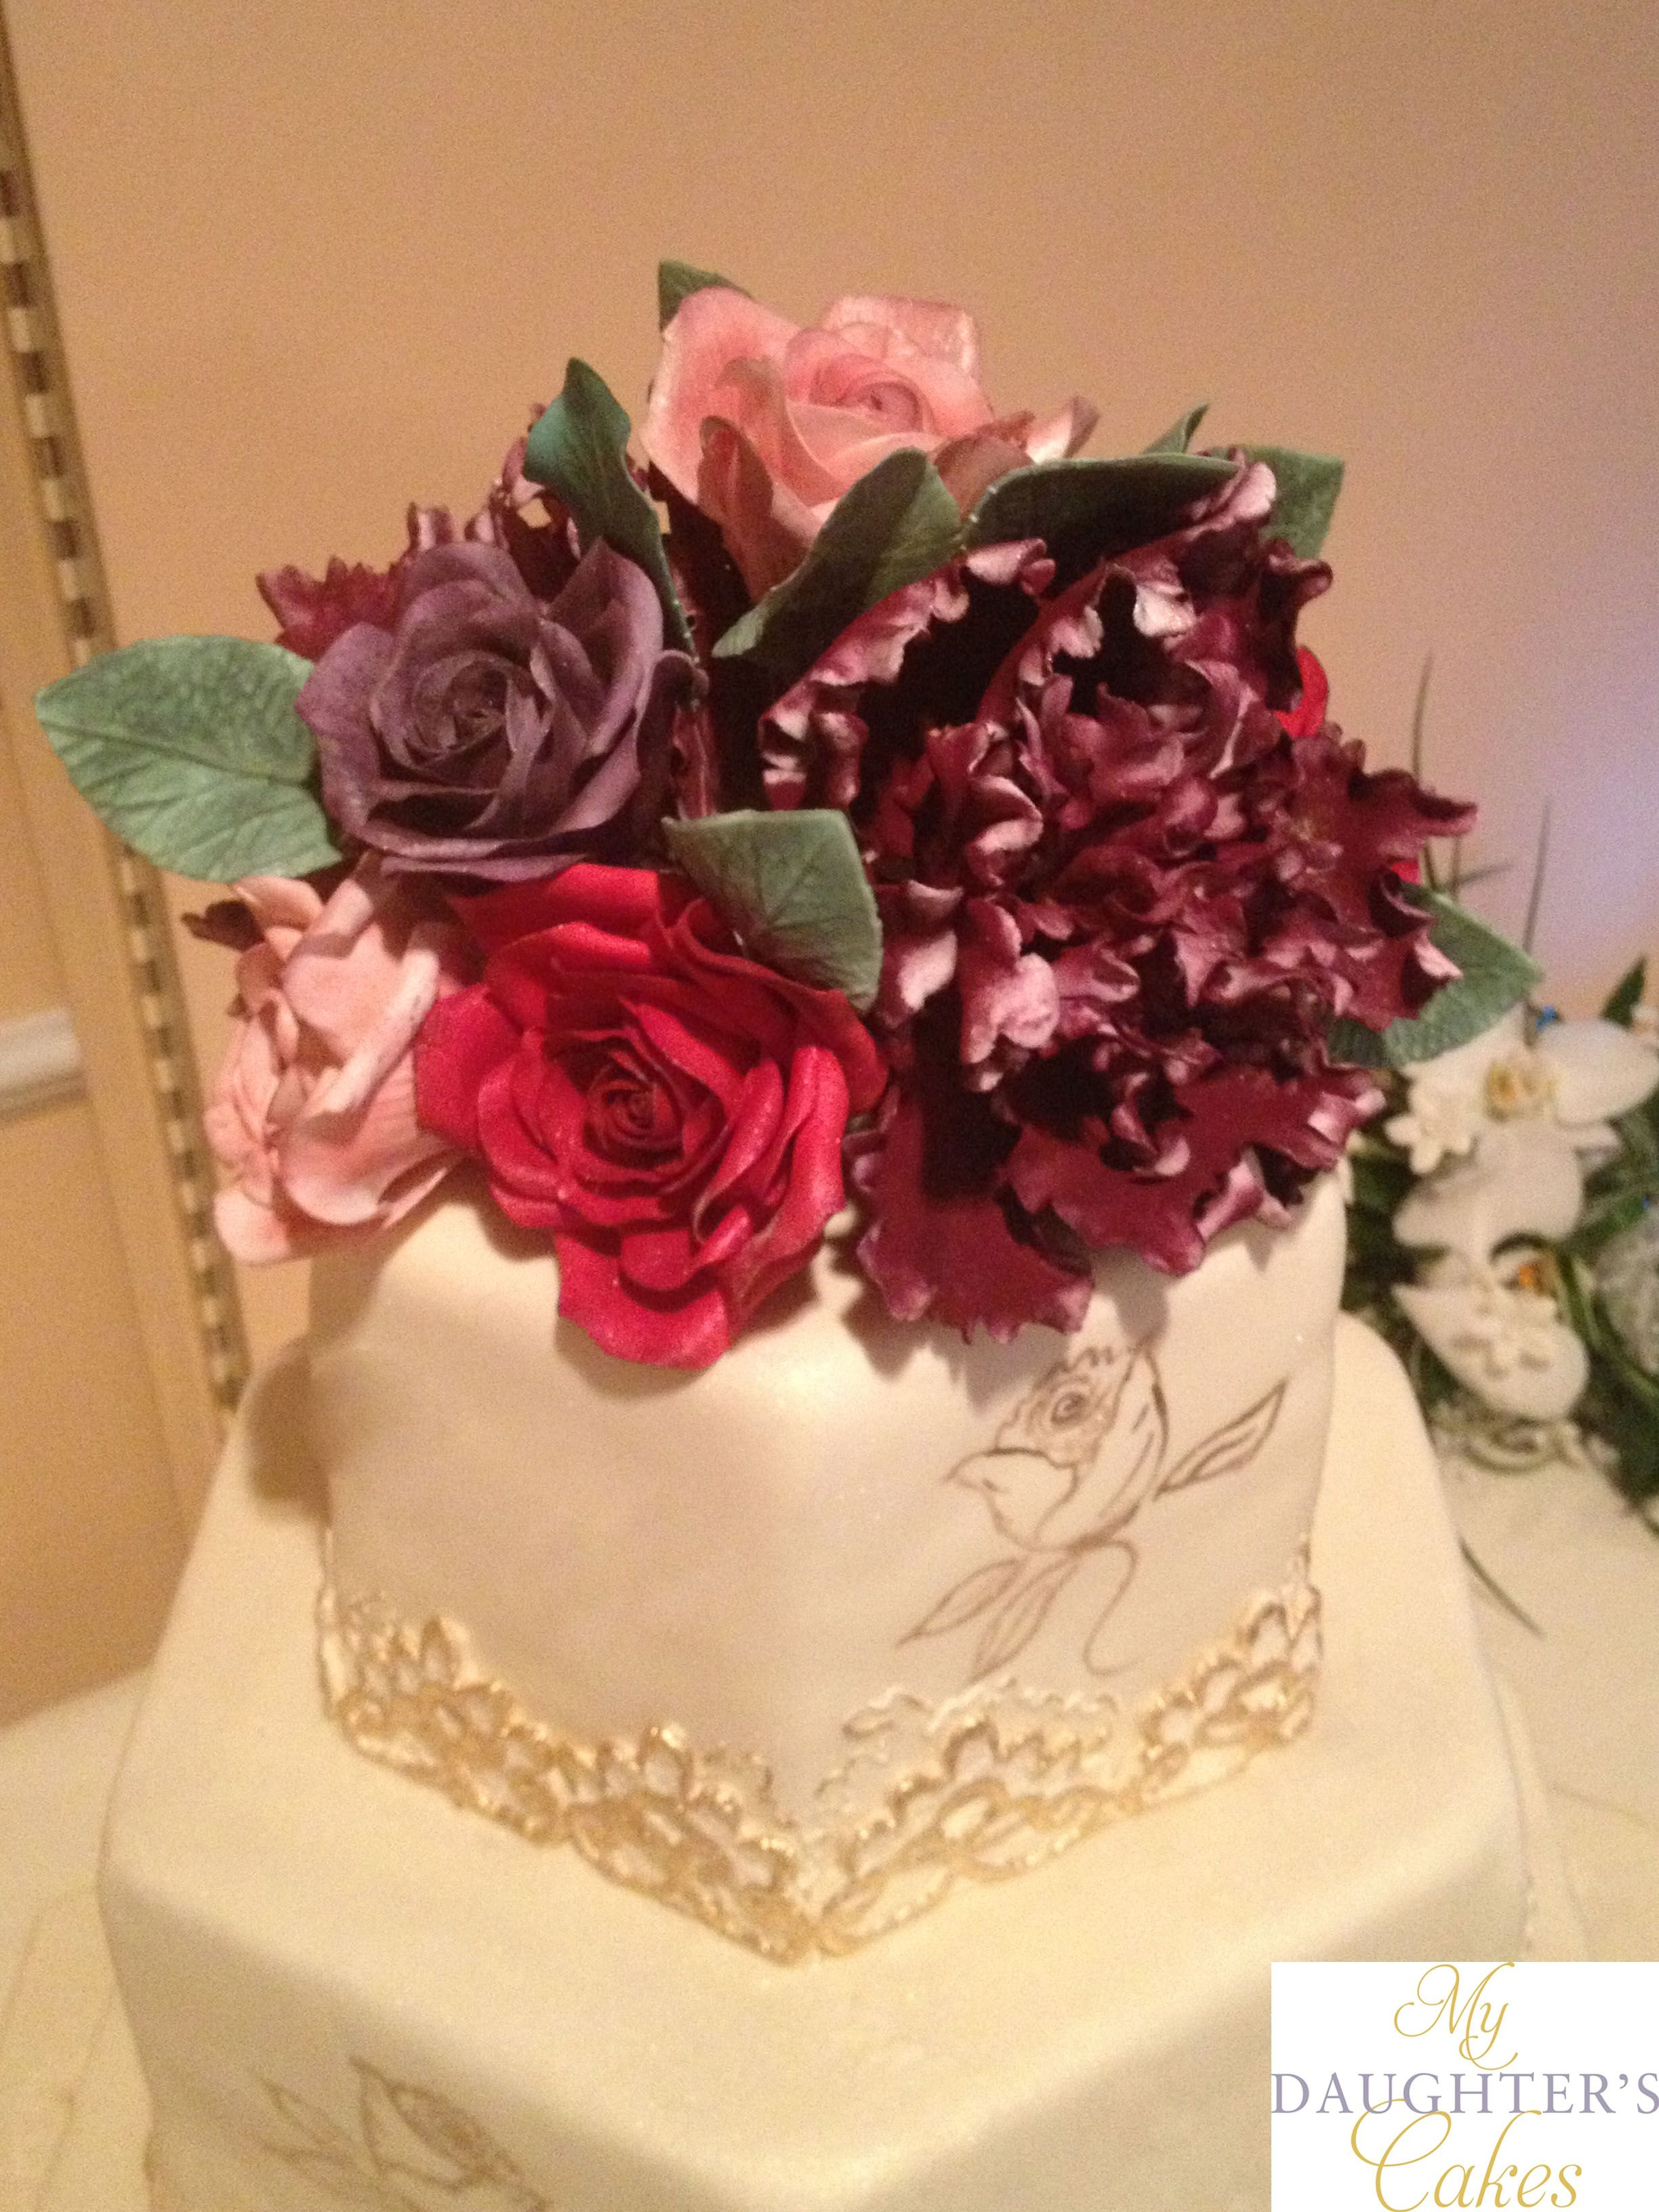 #sugarflowers by www.mydaughterscakes.com featuring bush peonies and roses #cakedesigner #njcakedesigner #nj #customcakes #goldcakes